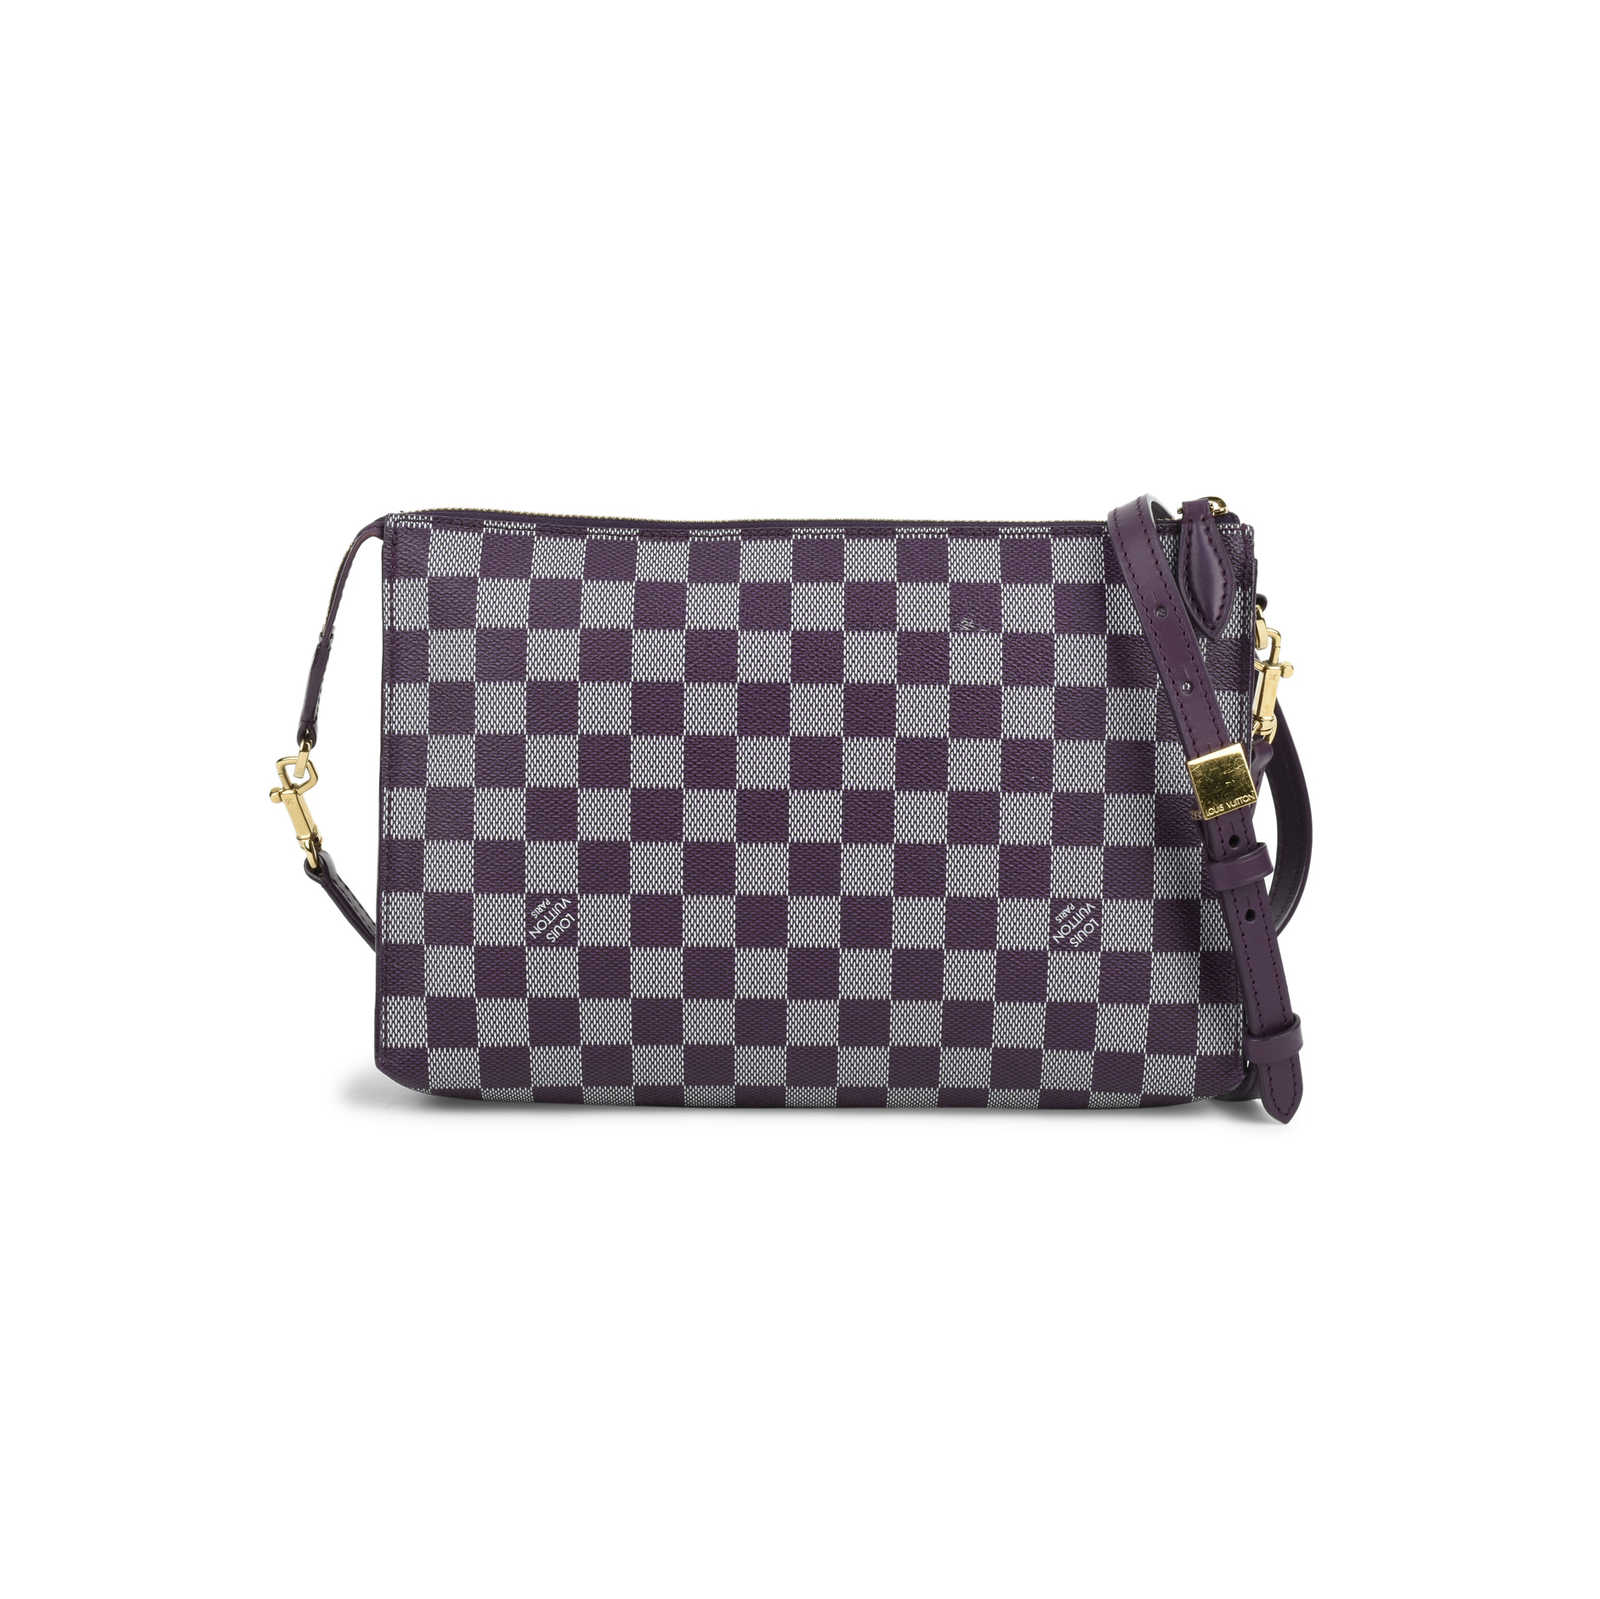 ac19bca7ccd3 Authentic Second Hand Louis Vuitton Damier Modul Crossbody Bag  (PSS-126-00071) ...